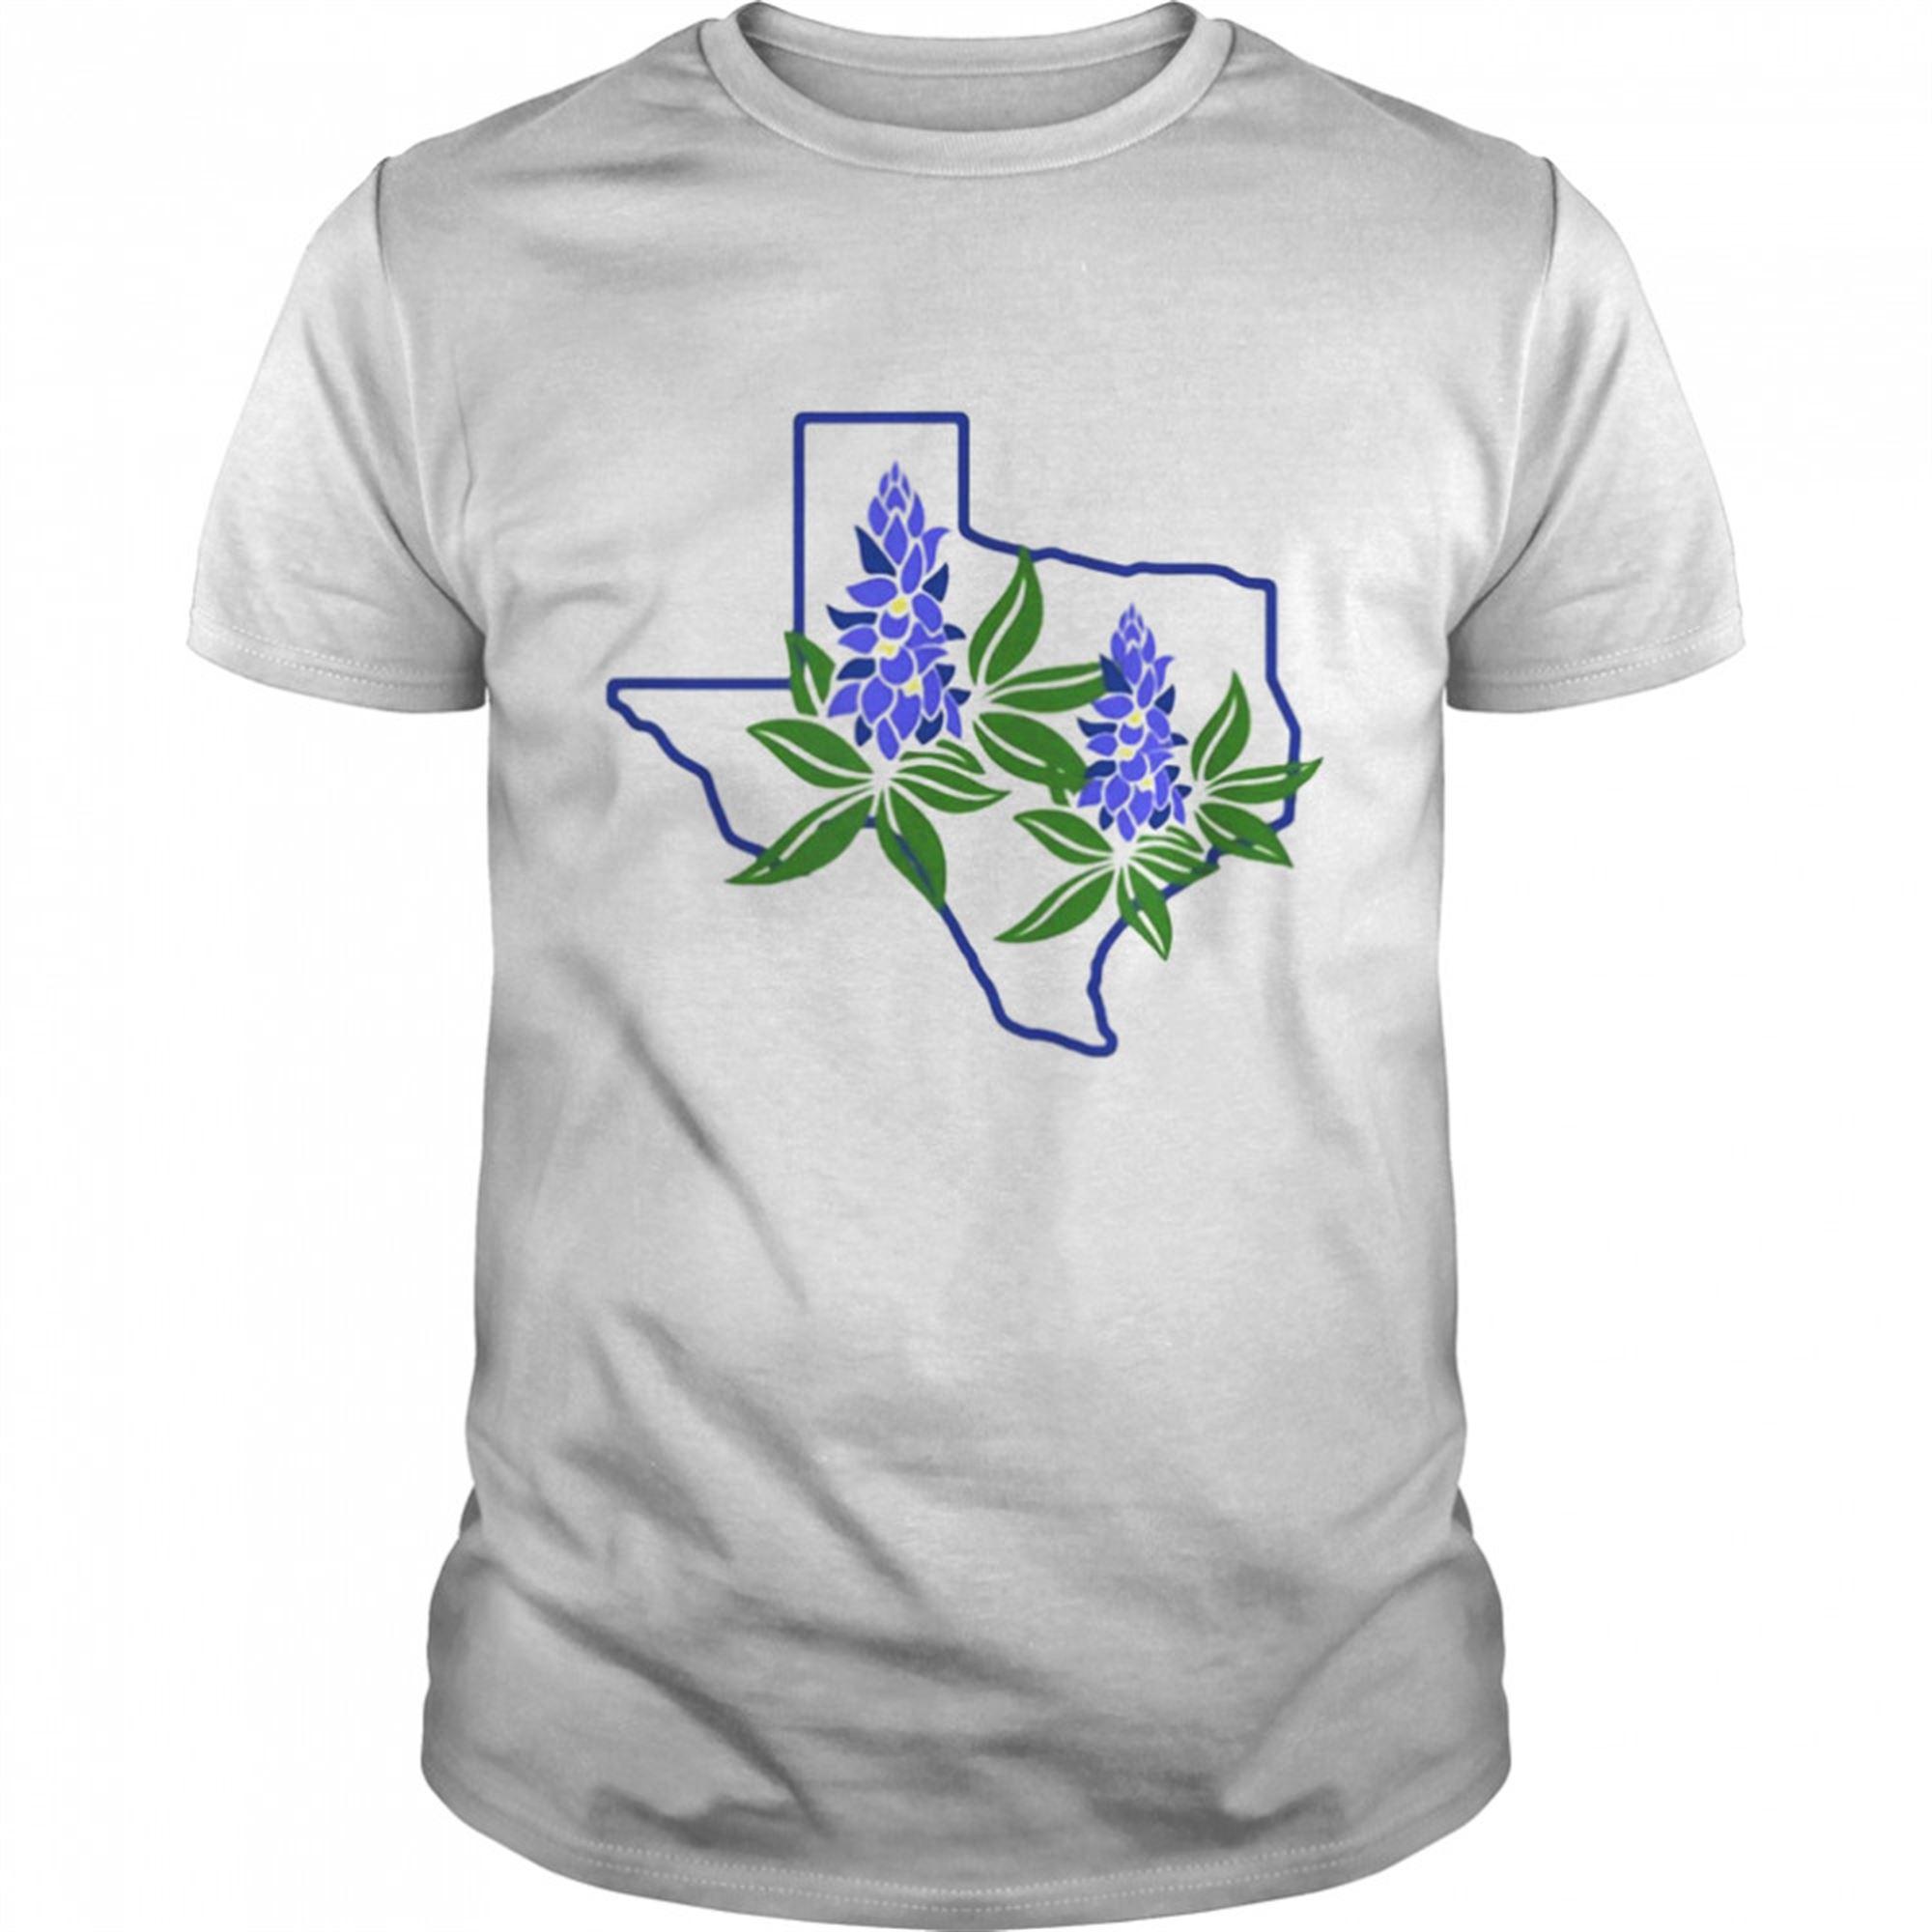 Awesome T-shirt Texas Bluebonnet Wildflowers T-shirt Hot 2021